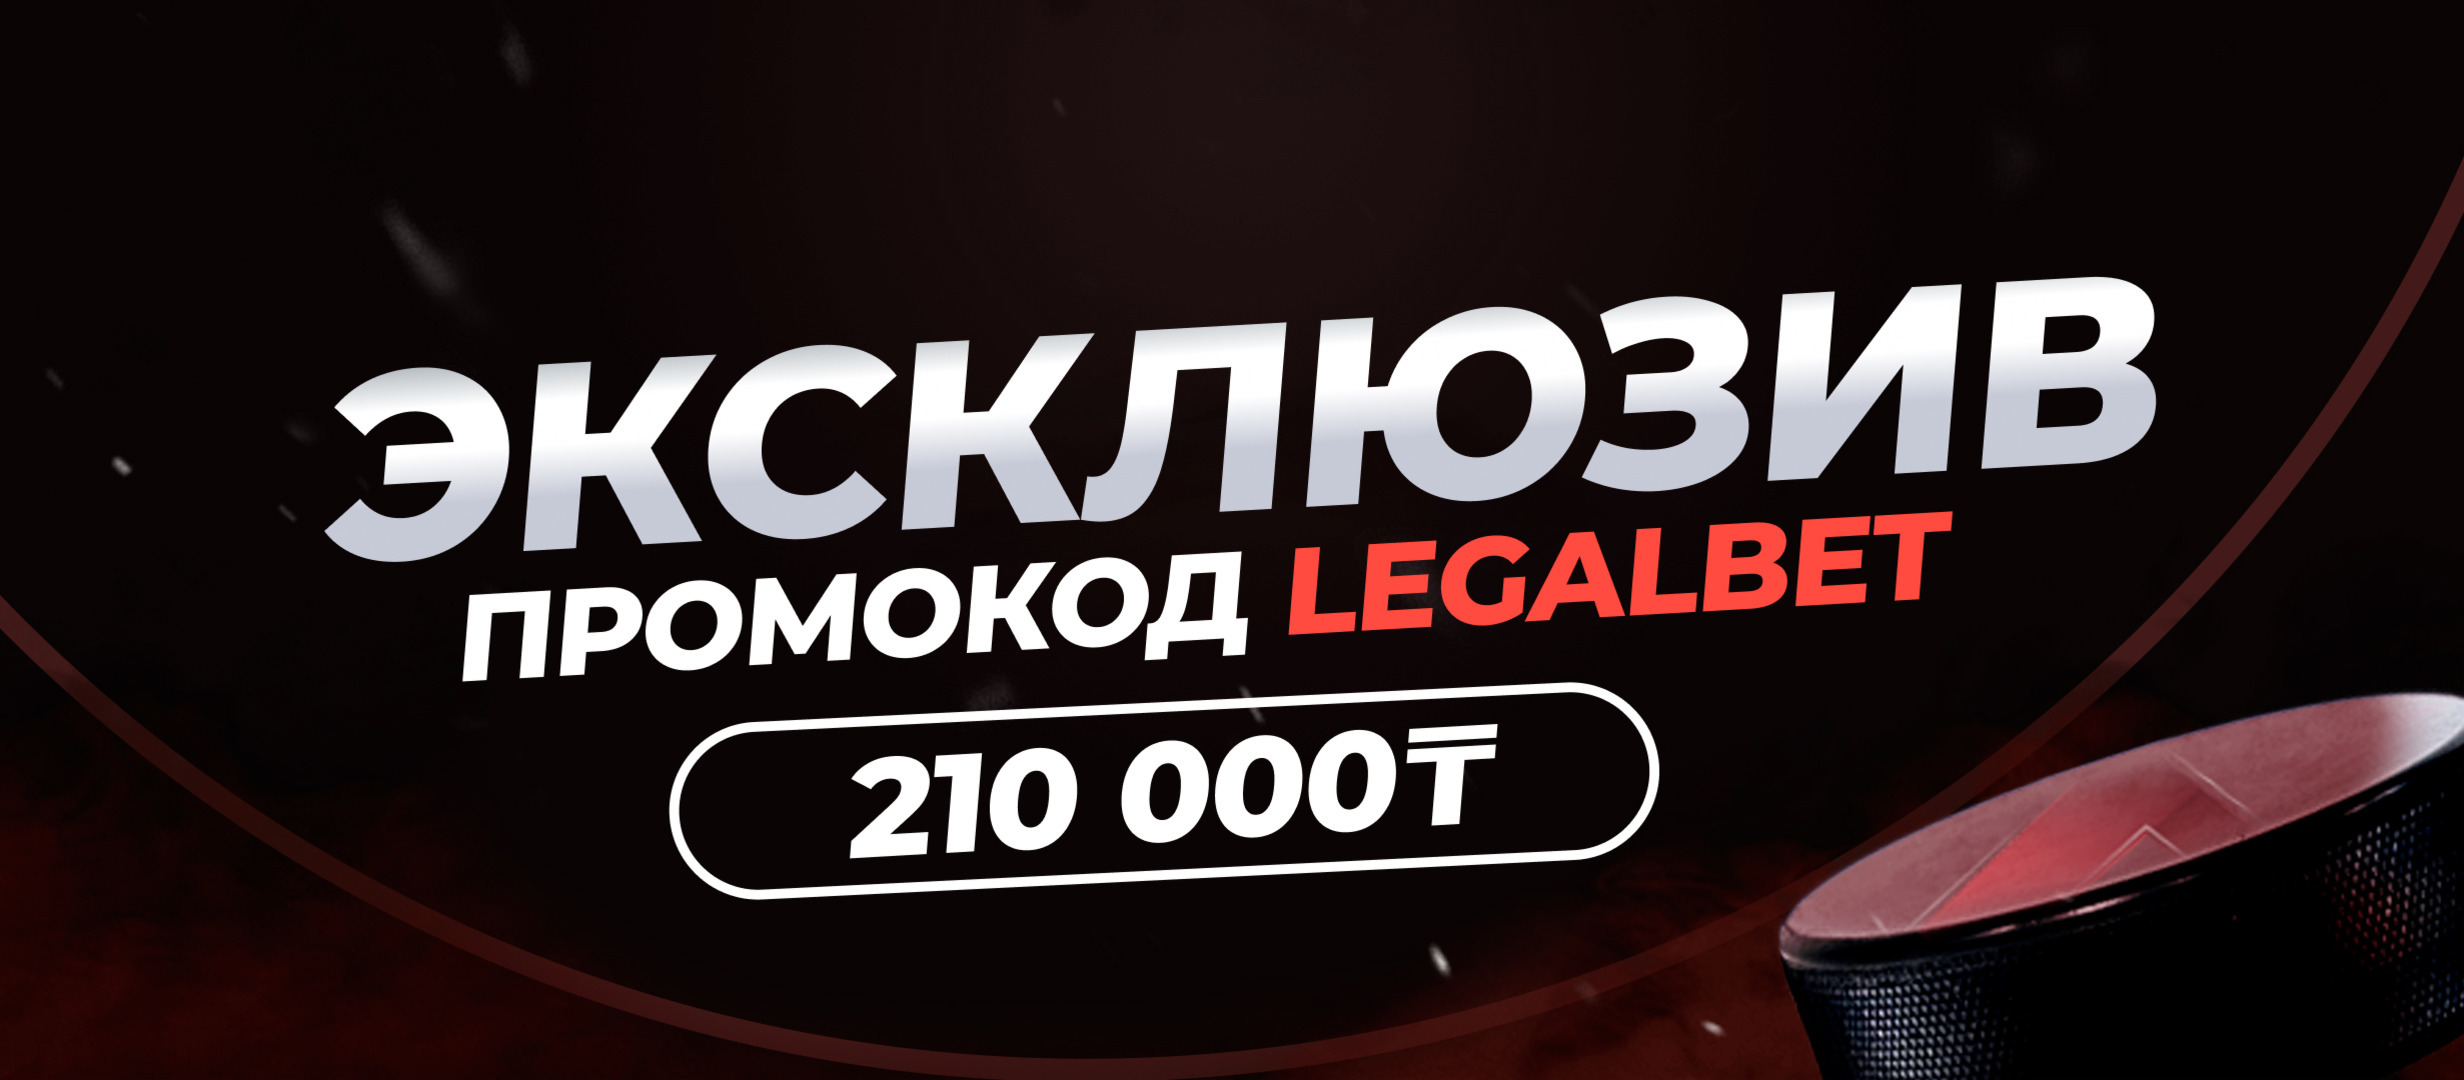 Кеш-бонус от Тенниси 210000 ₸.